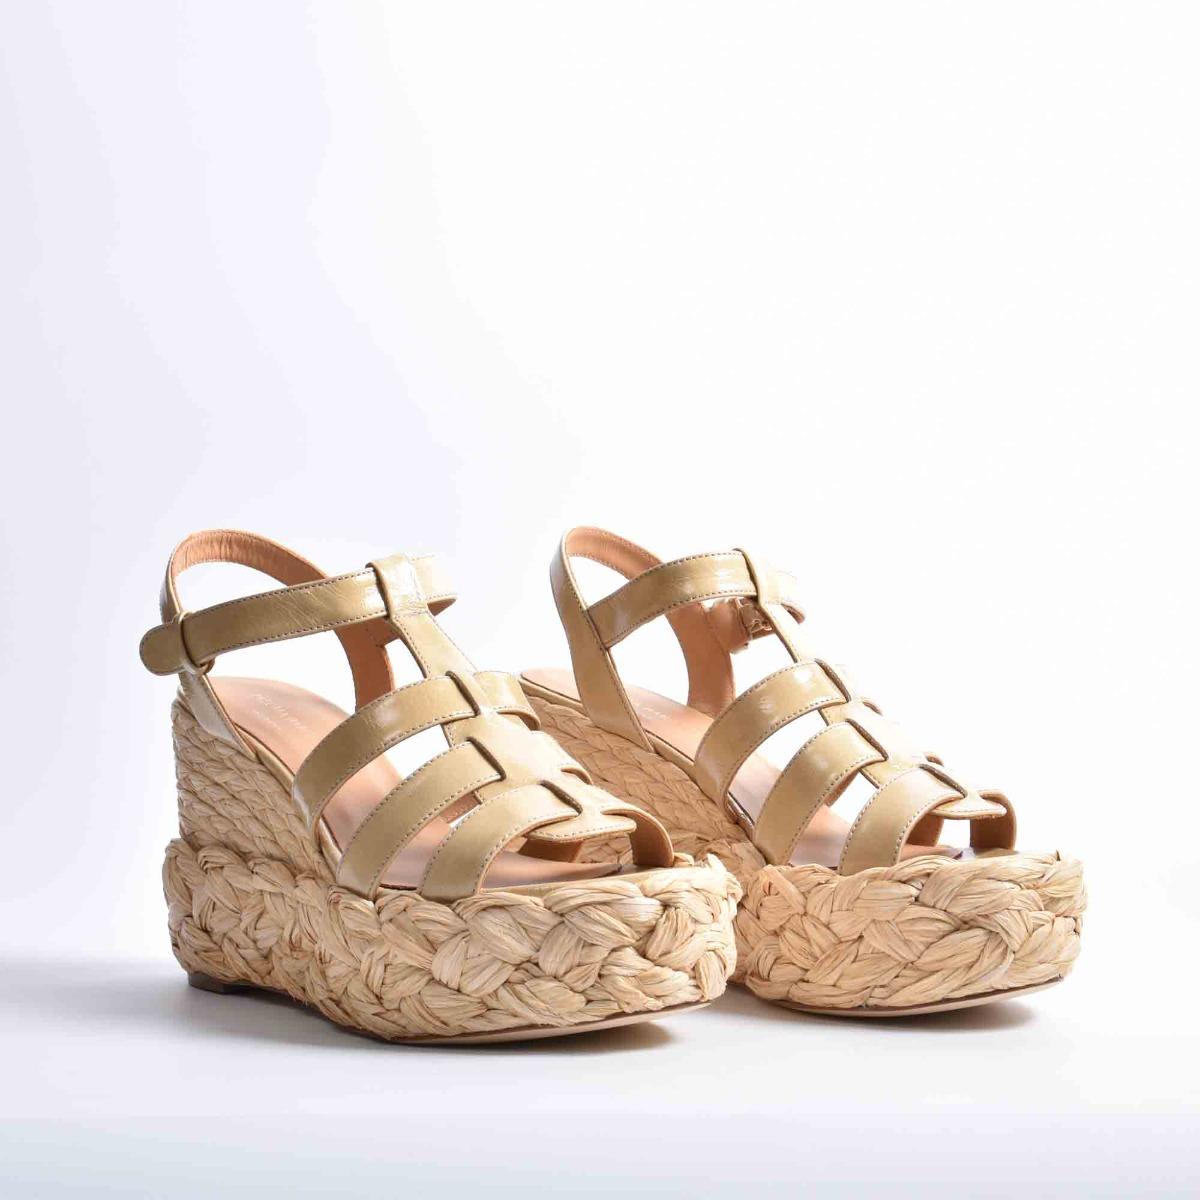 Sandalo atelchu lory - Torrone